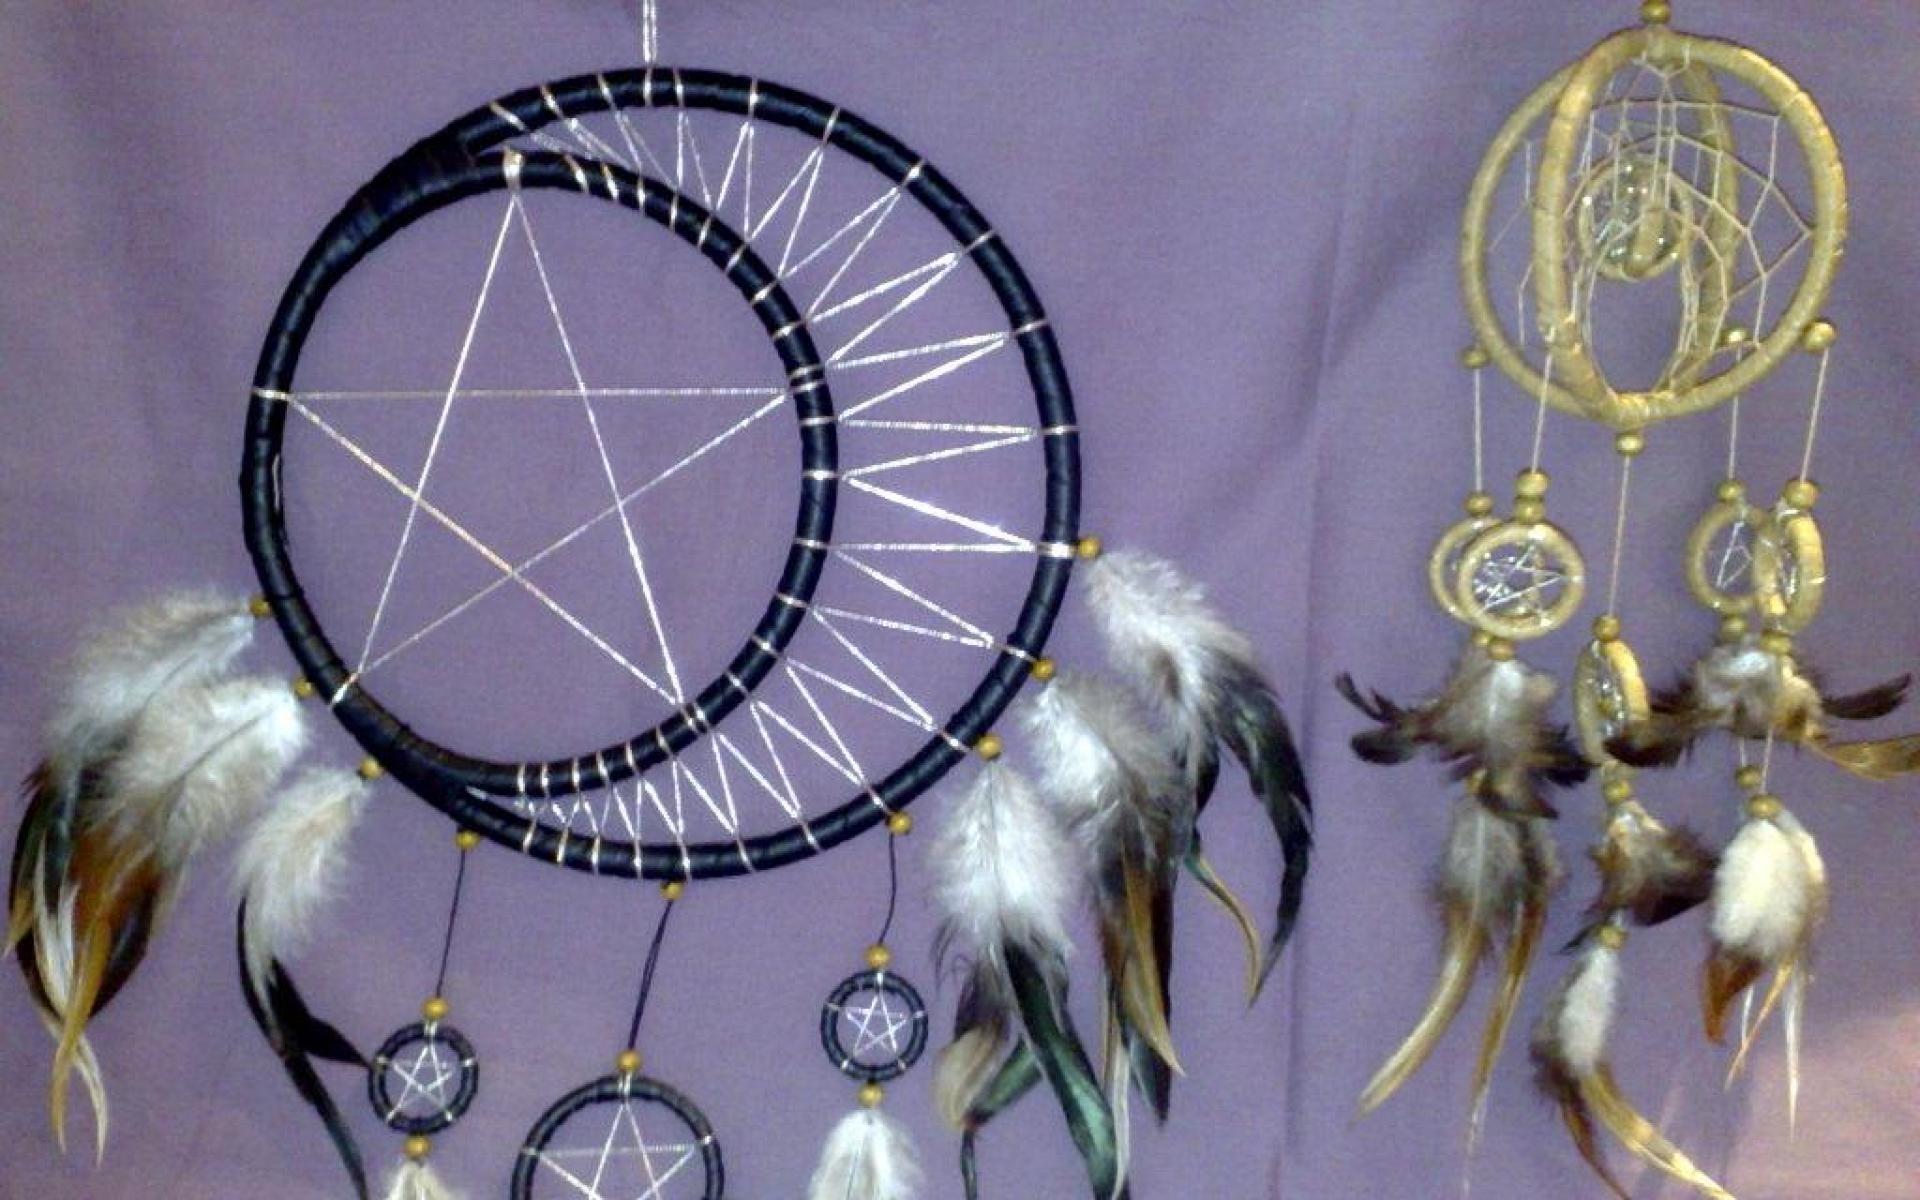 Dreamcatcher Wallpaper Tumblr (57+ Images